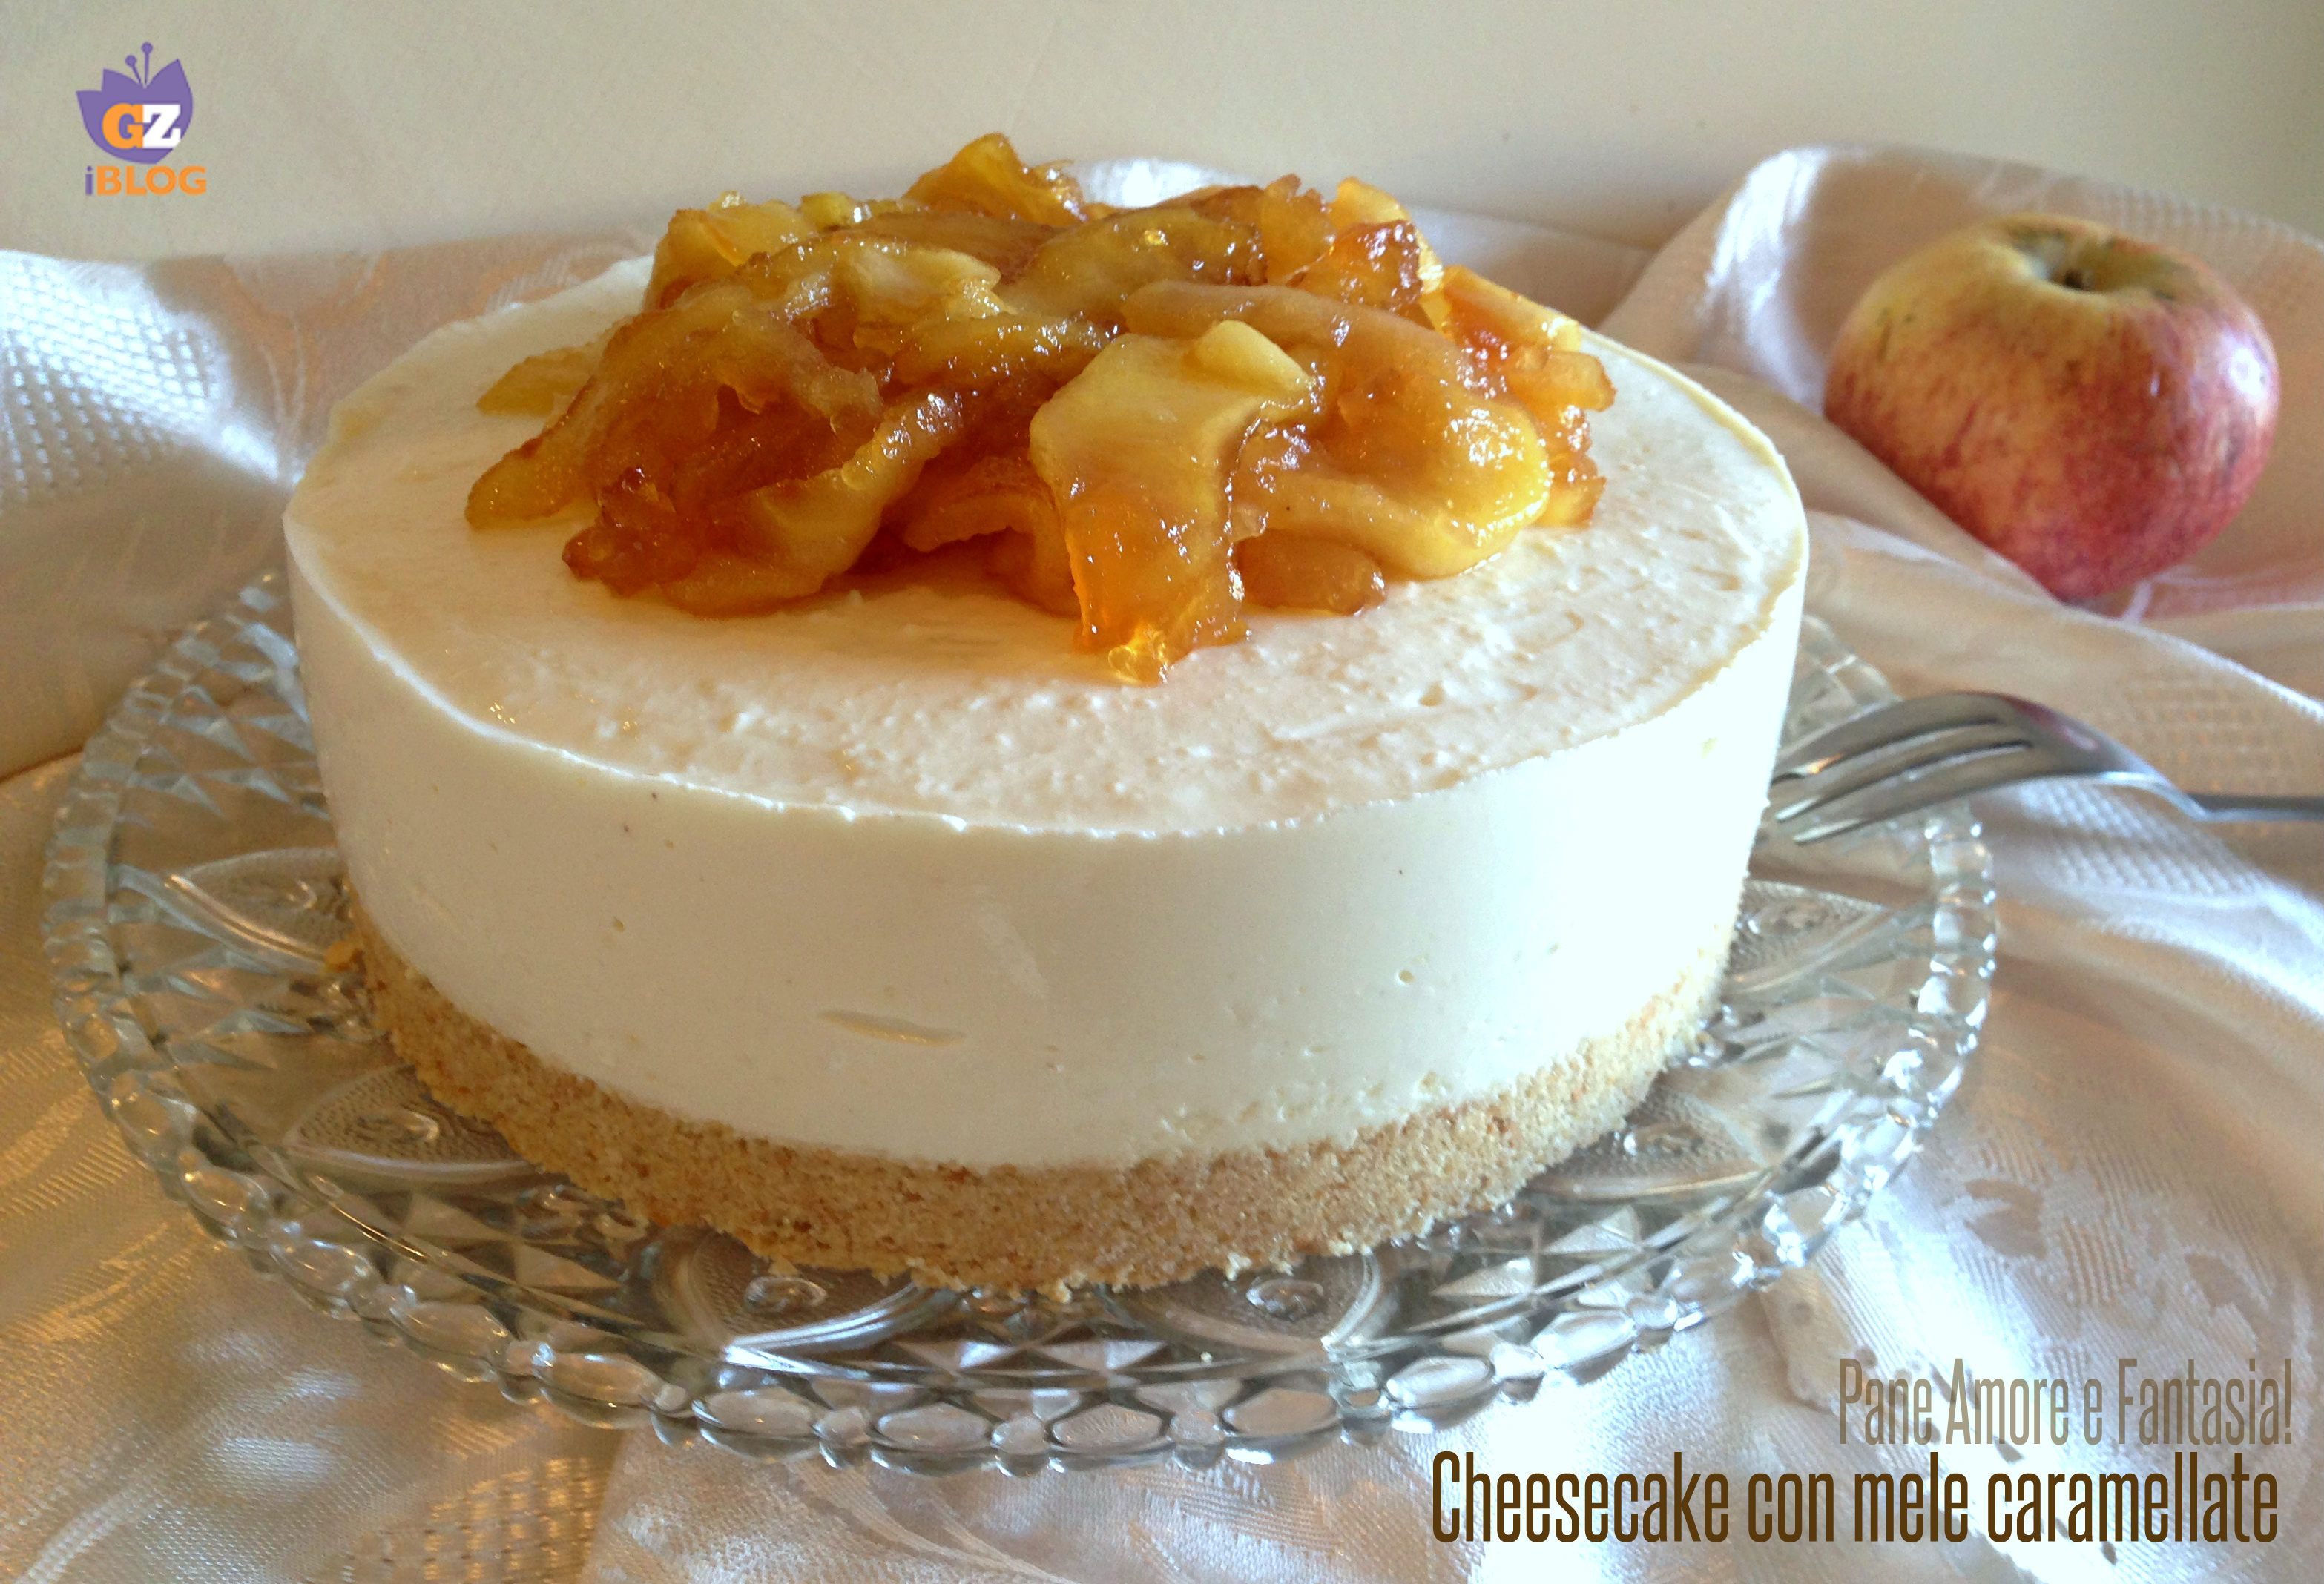 Cheesecake con mele caramellate - senza cottura